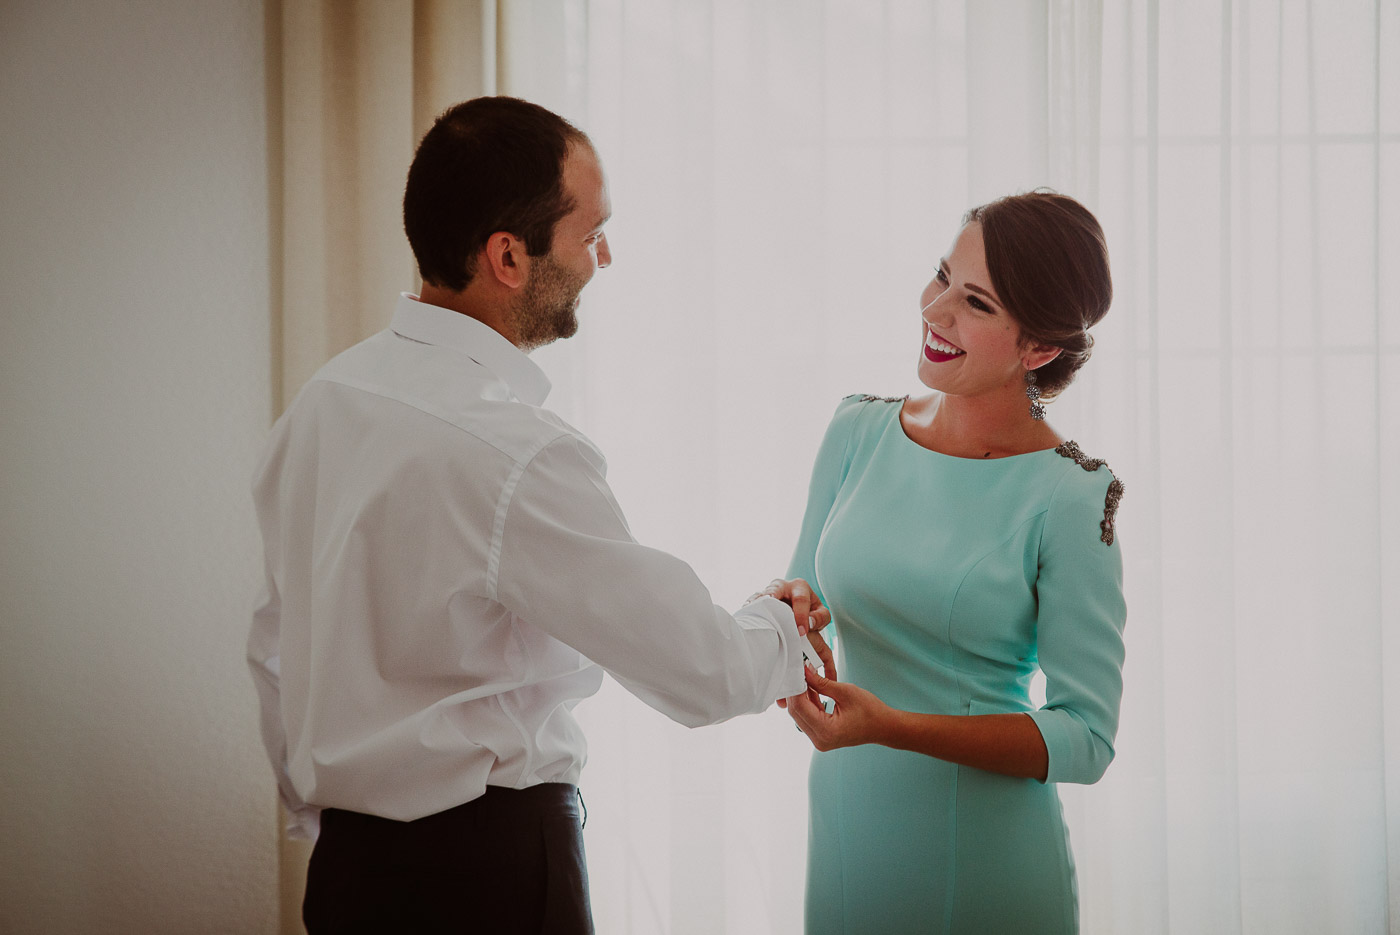 fotografo-bodas-Cordoba-Salesianos-Hotel-Ayre-manuel-fijo